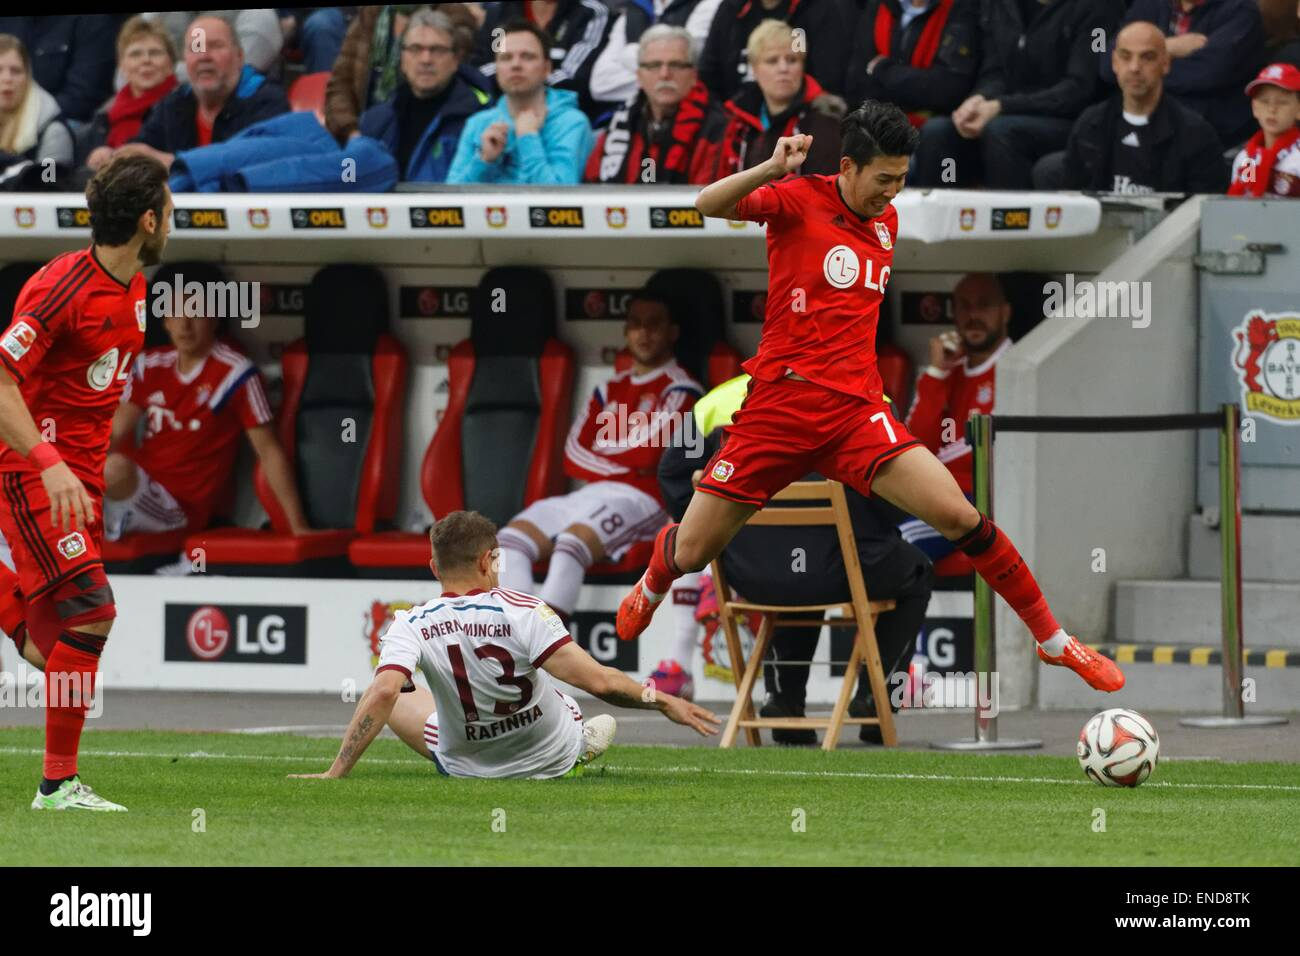 Leverkusen Germany Immagini e Fotos Stock - Alamy